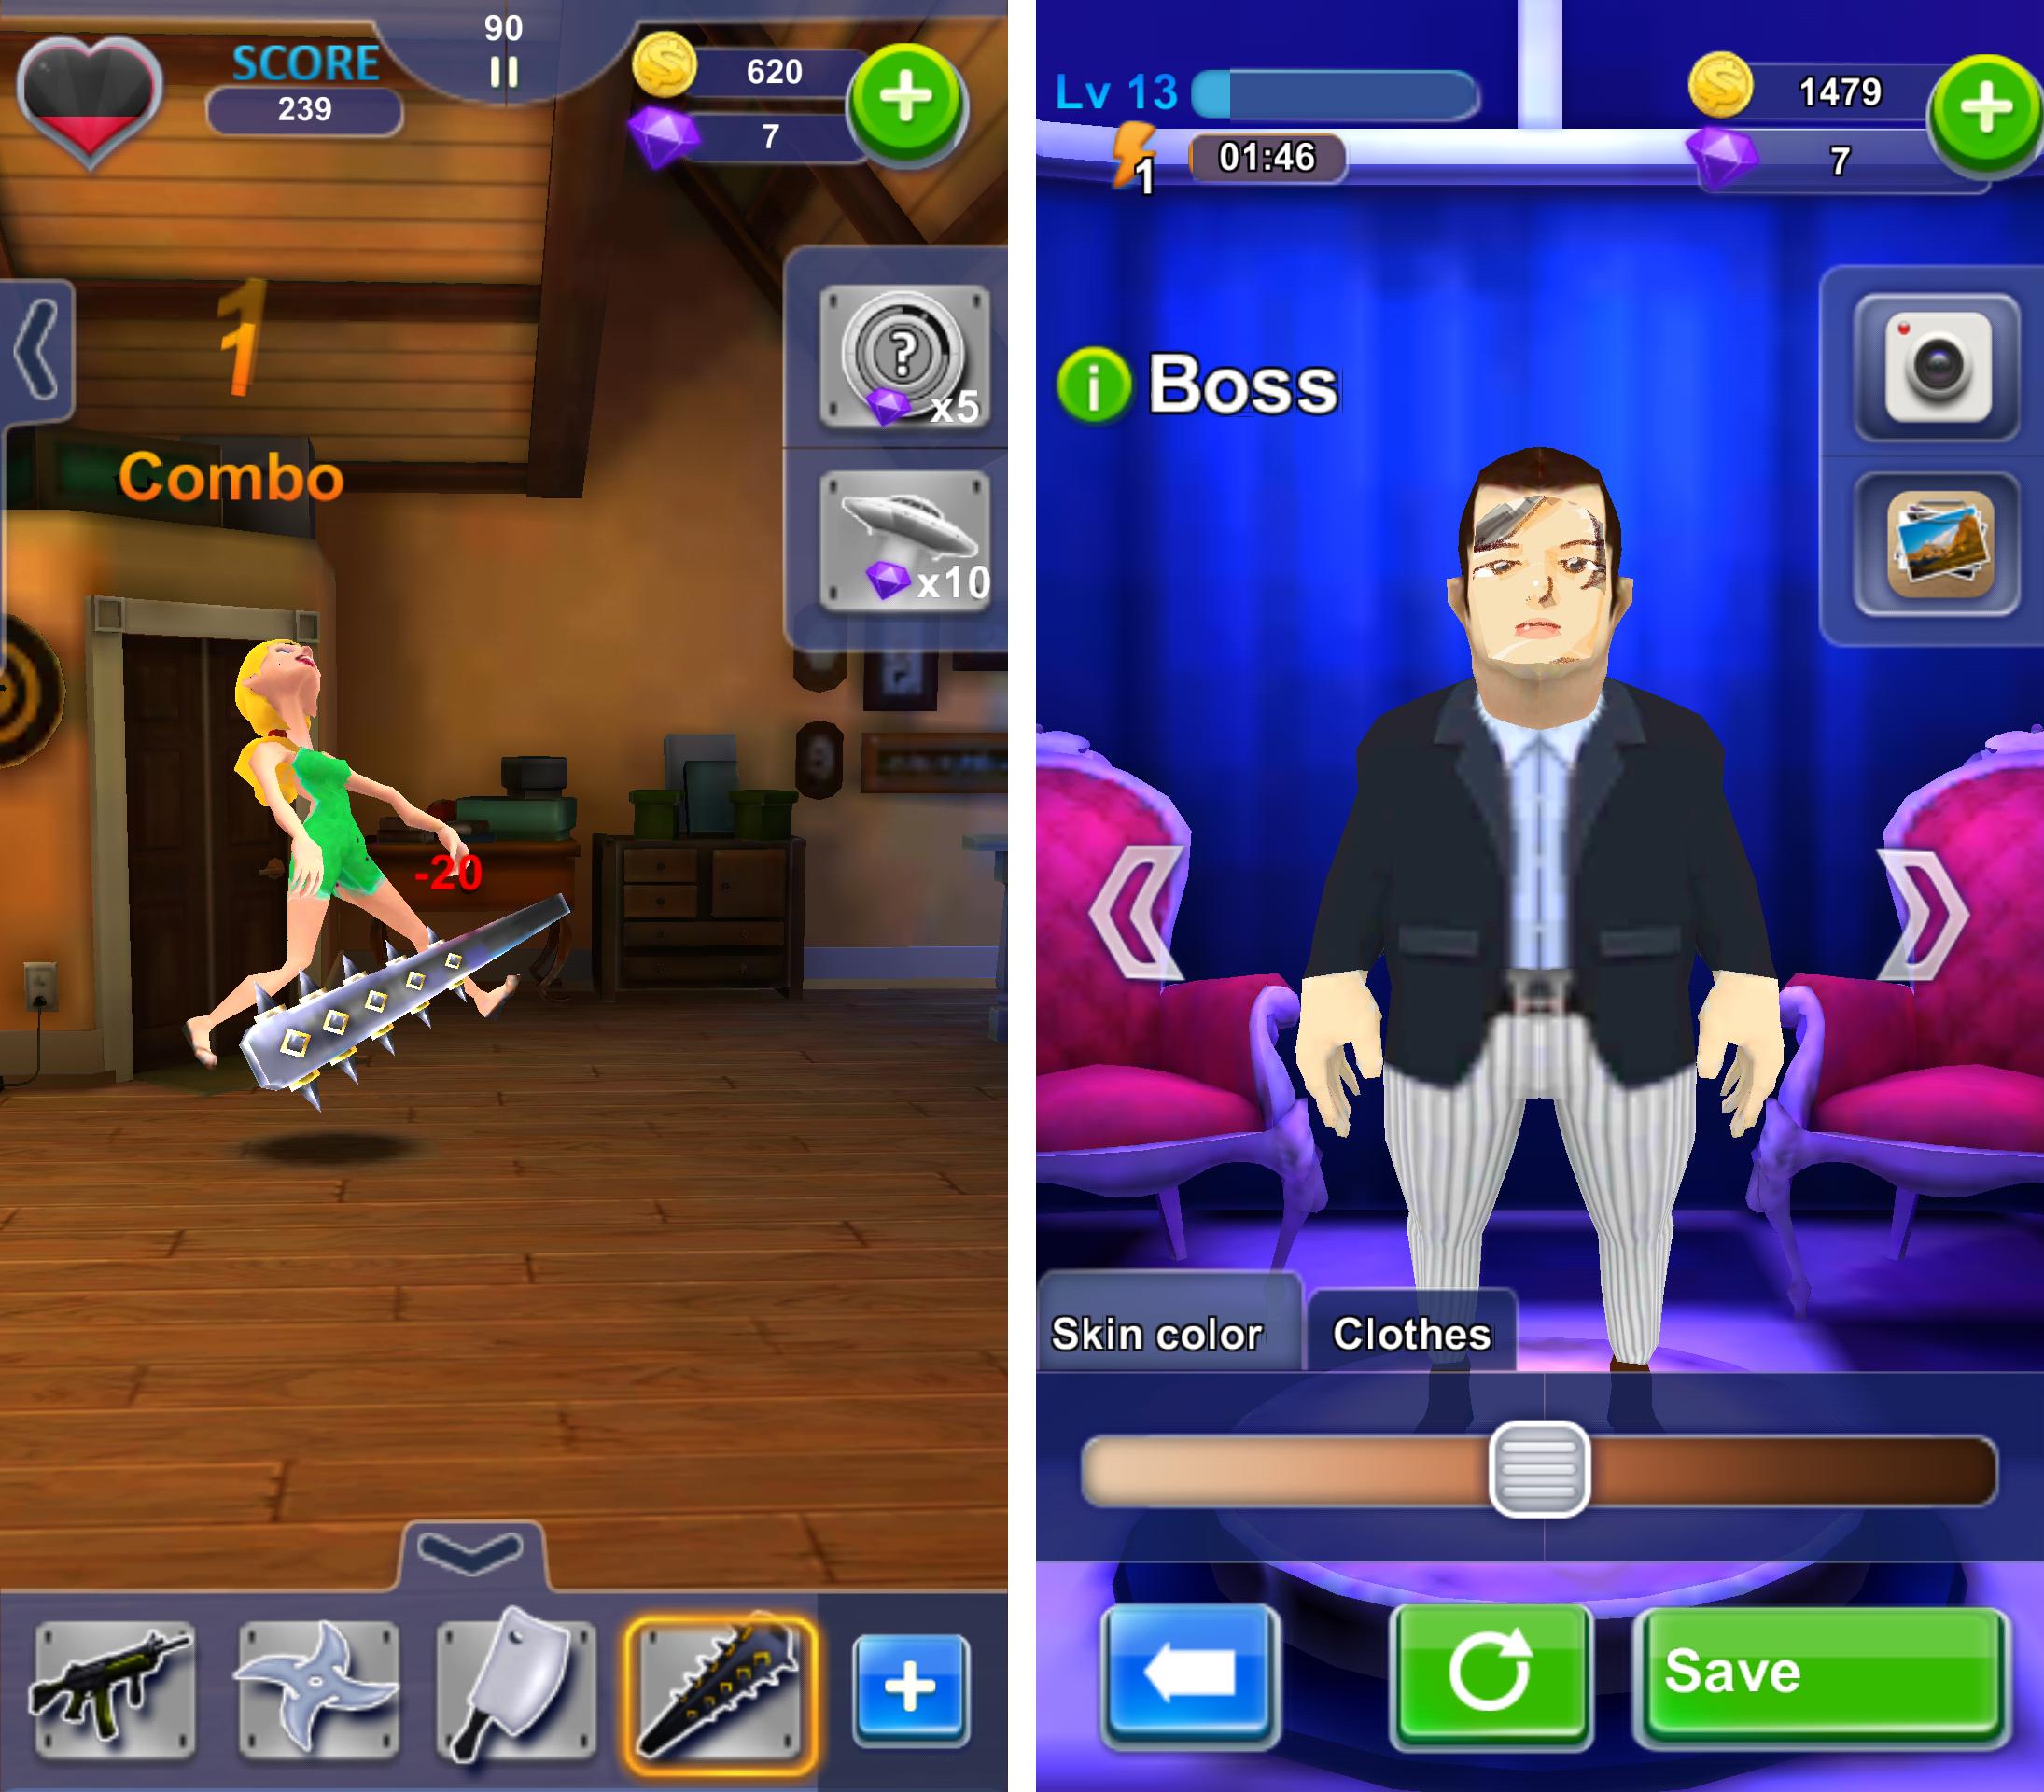 Whack the Boss(上司いじめ) androidアプリスクリーンショット3